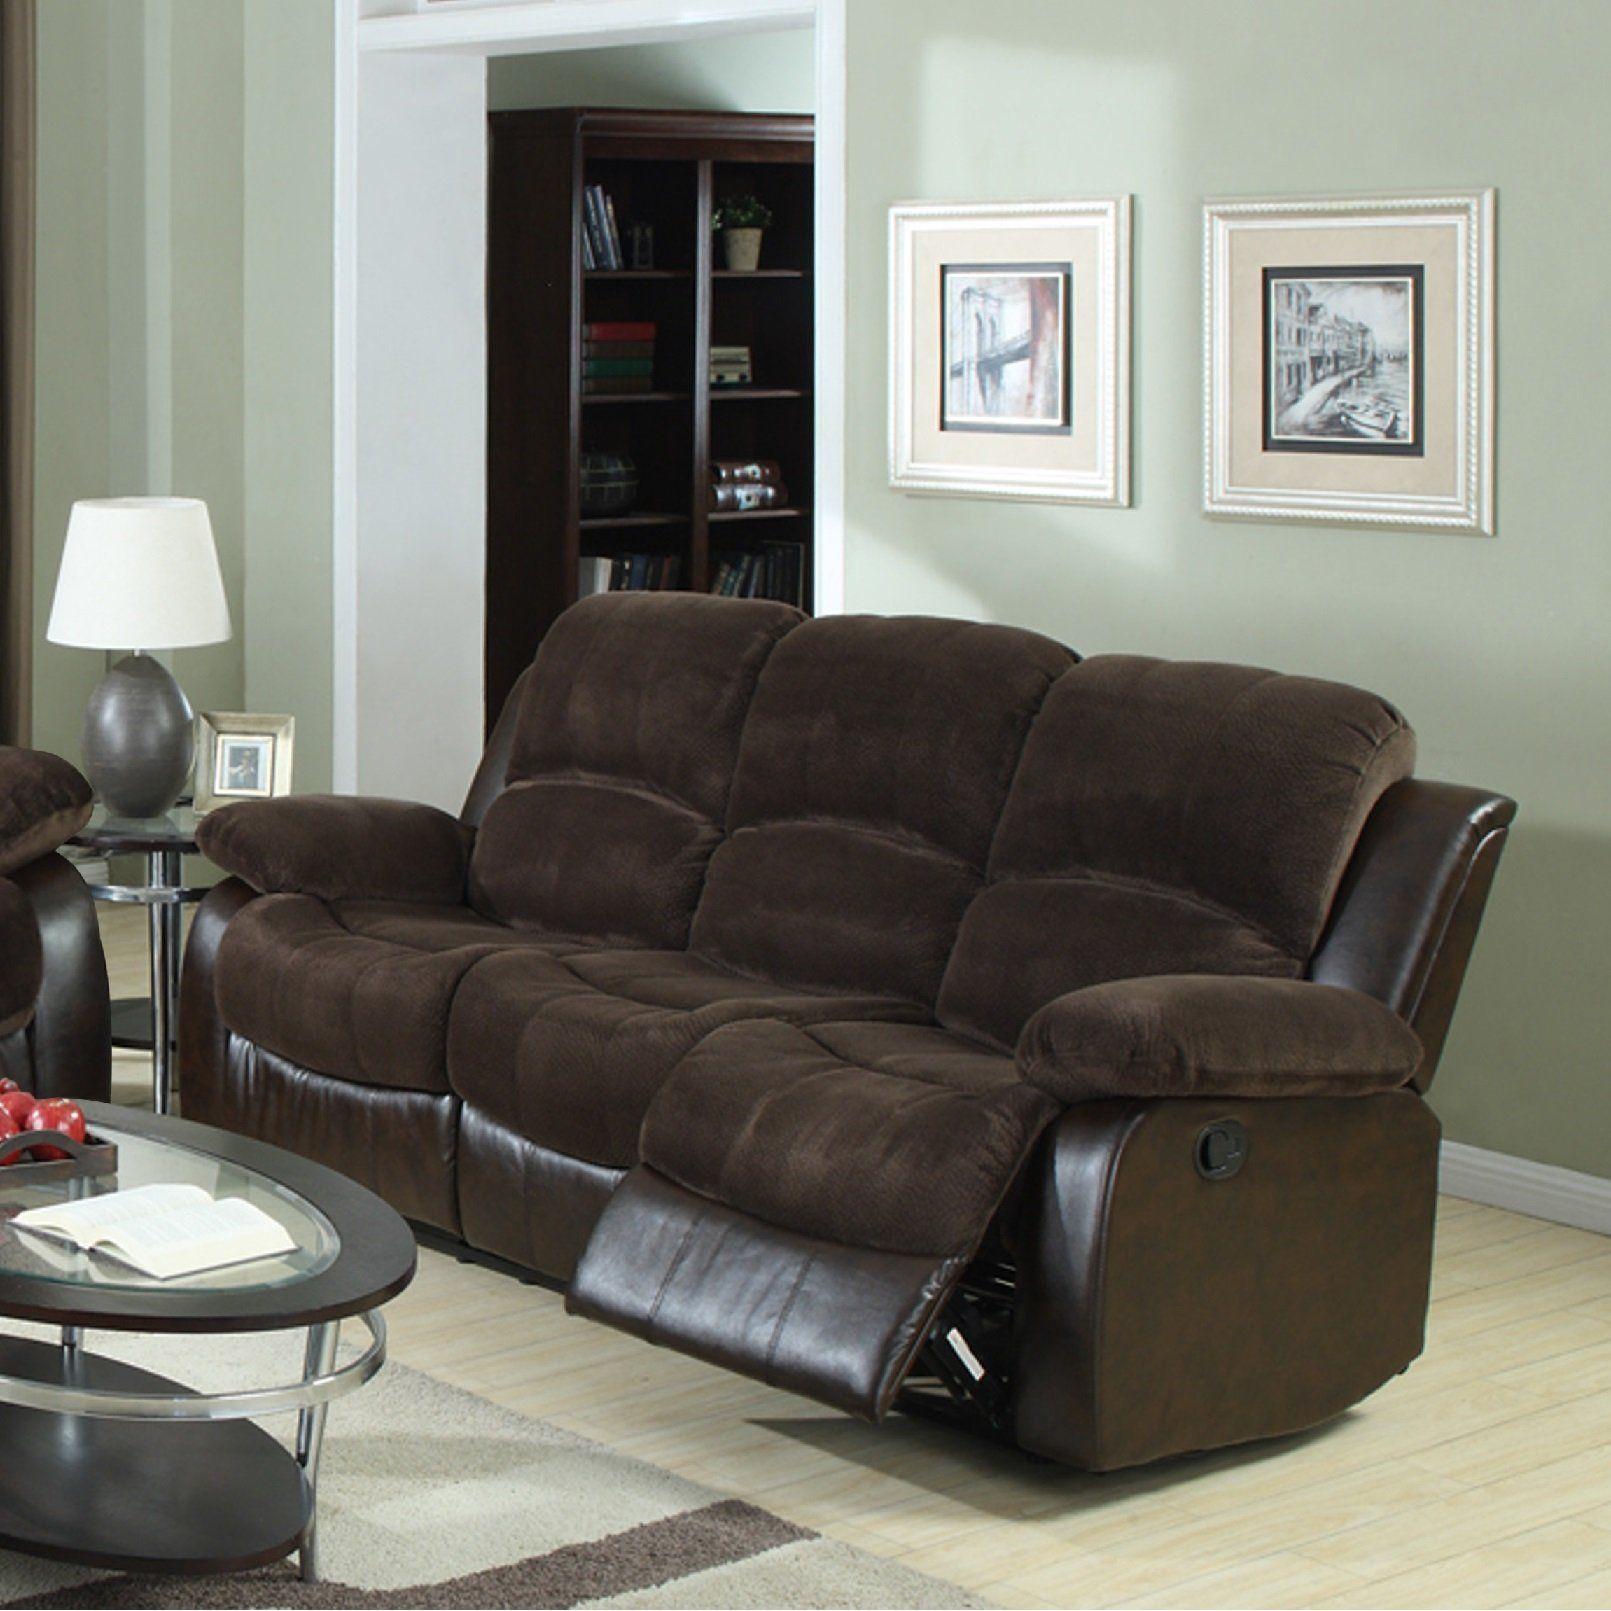 Furnituremaxx Chocolate Chaimpin Microfiber Double